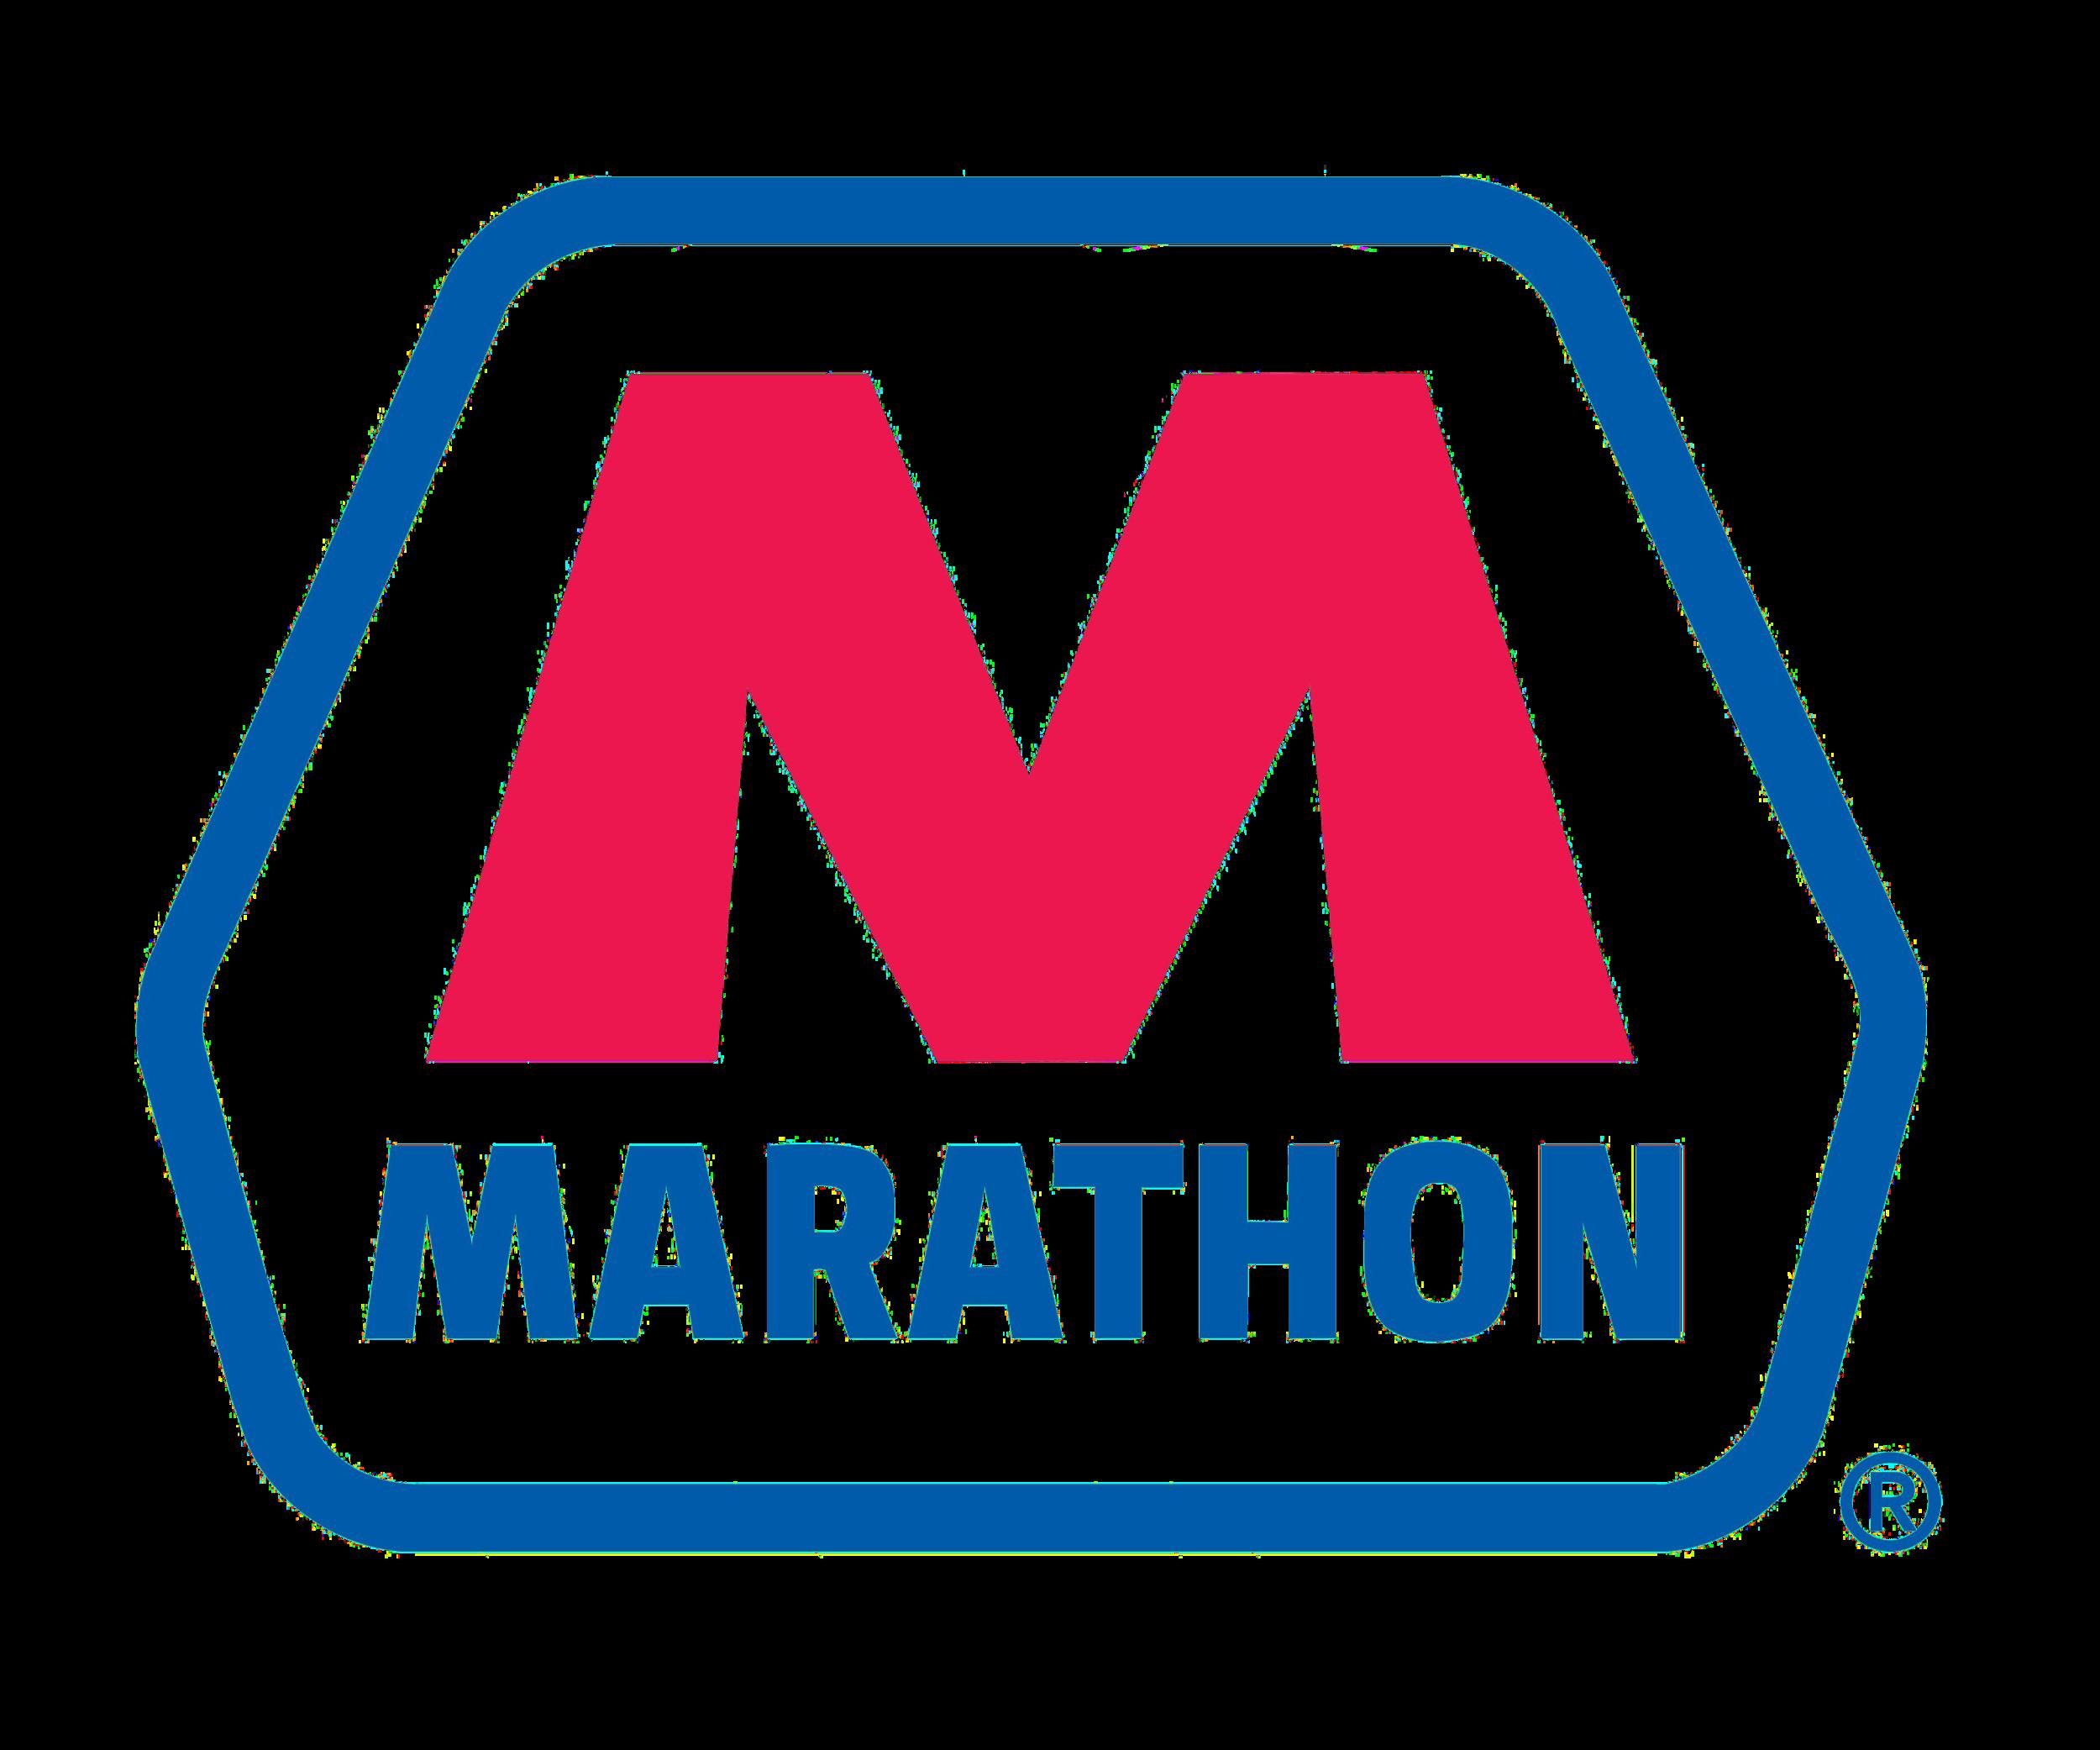 purepng.com-marathon-petroleum-logologobrand-logoiconslogos-251519939779jjdid.png